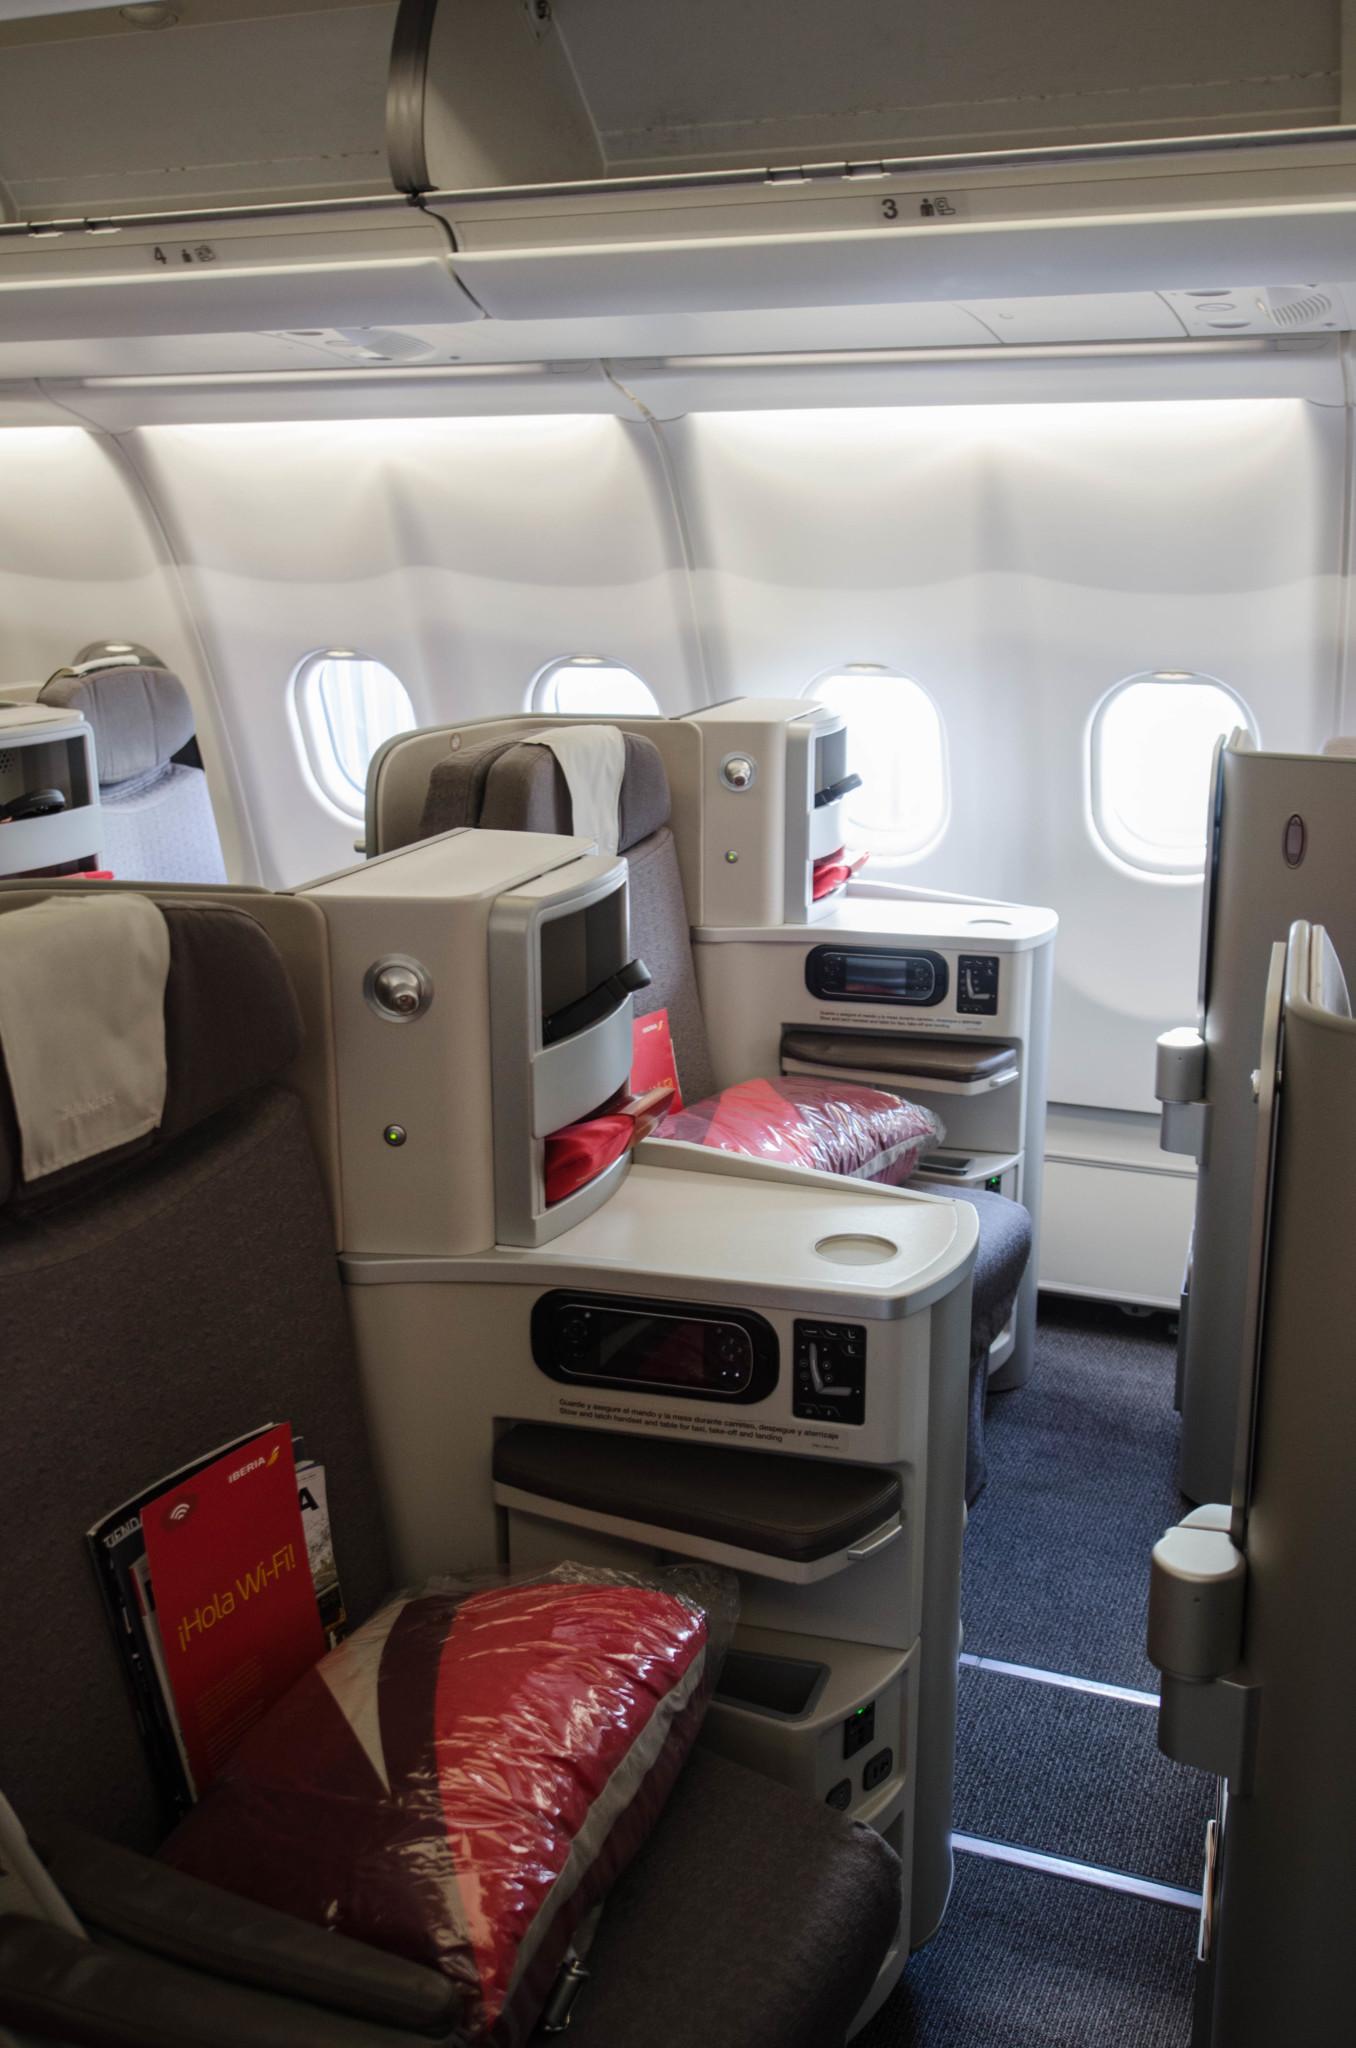 Kabine auf dem Flug nach Havanna